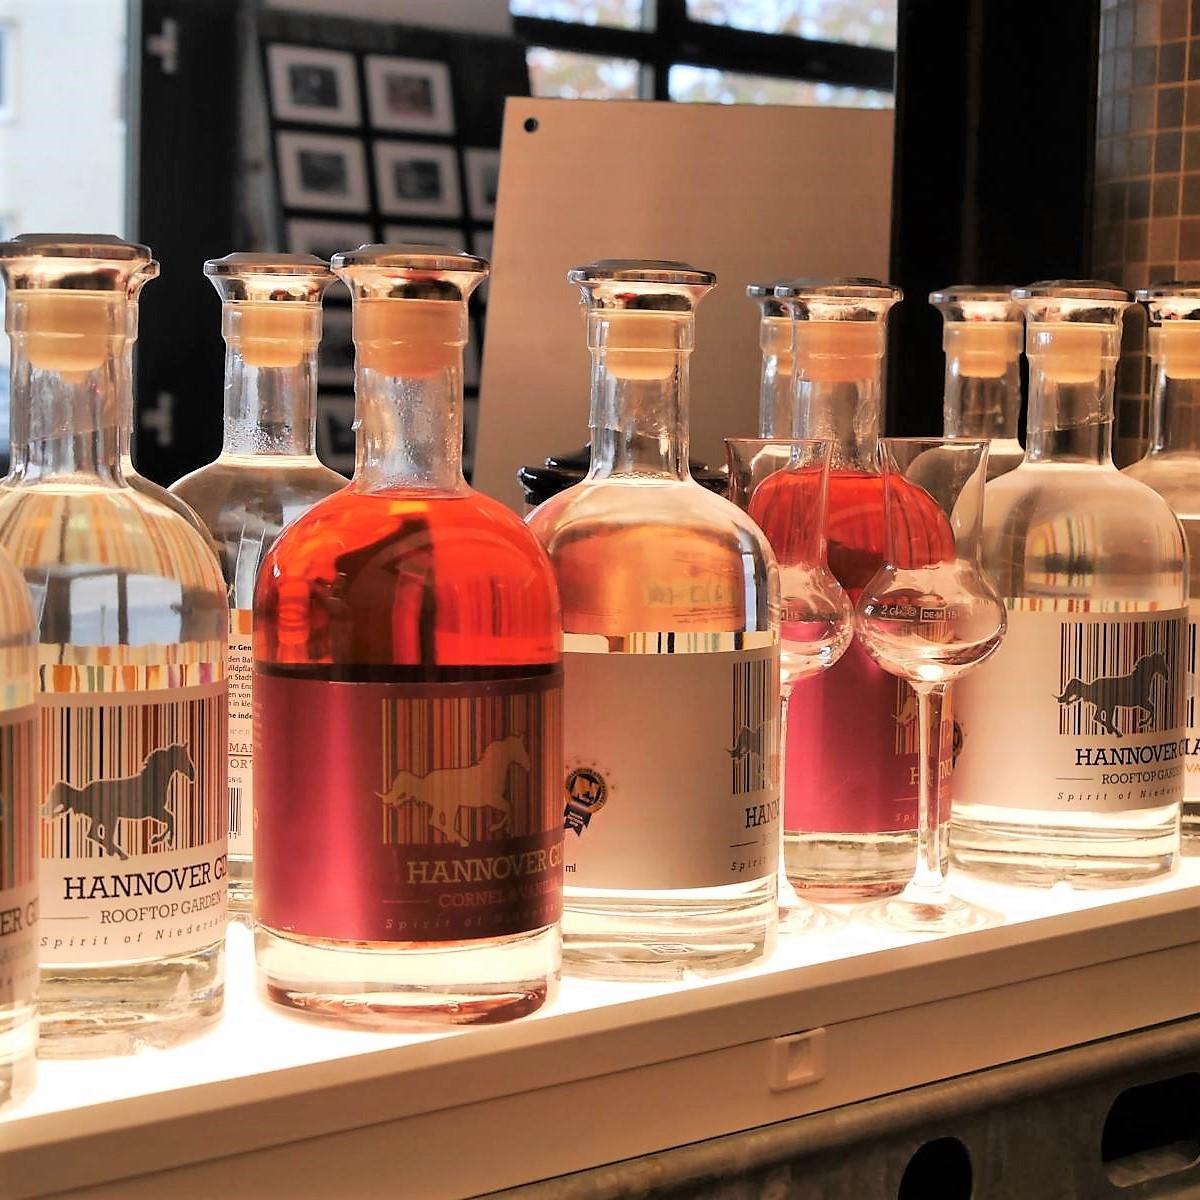 Style Hannover Hannver Gin 2 - Hannover Gin - Der Spirit Niedersachsens